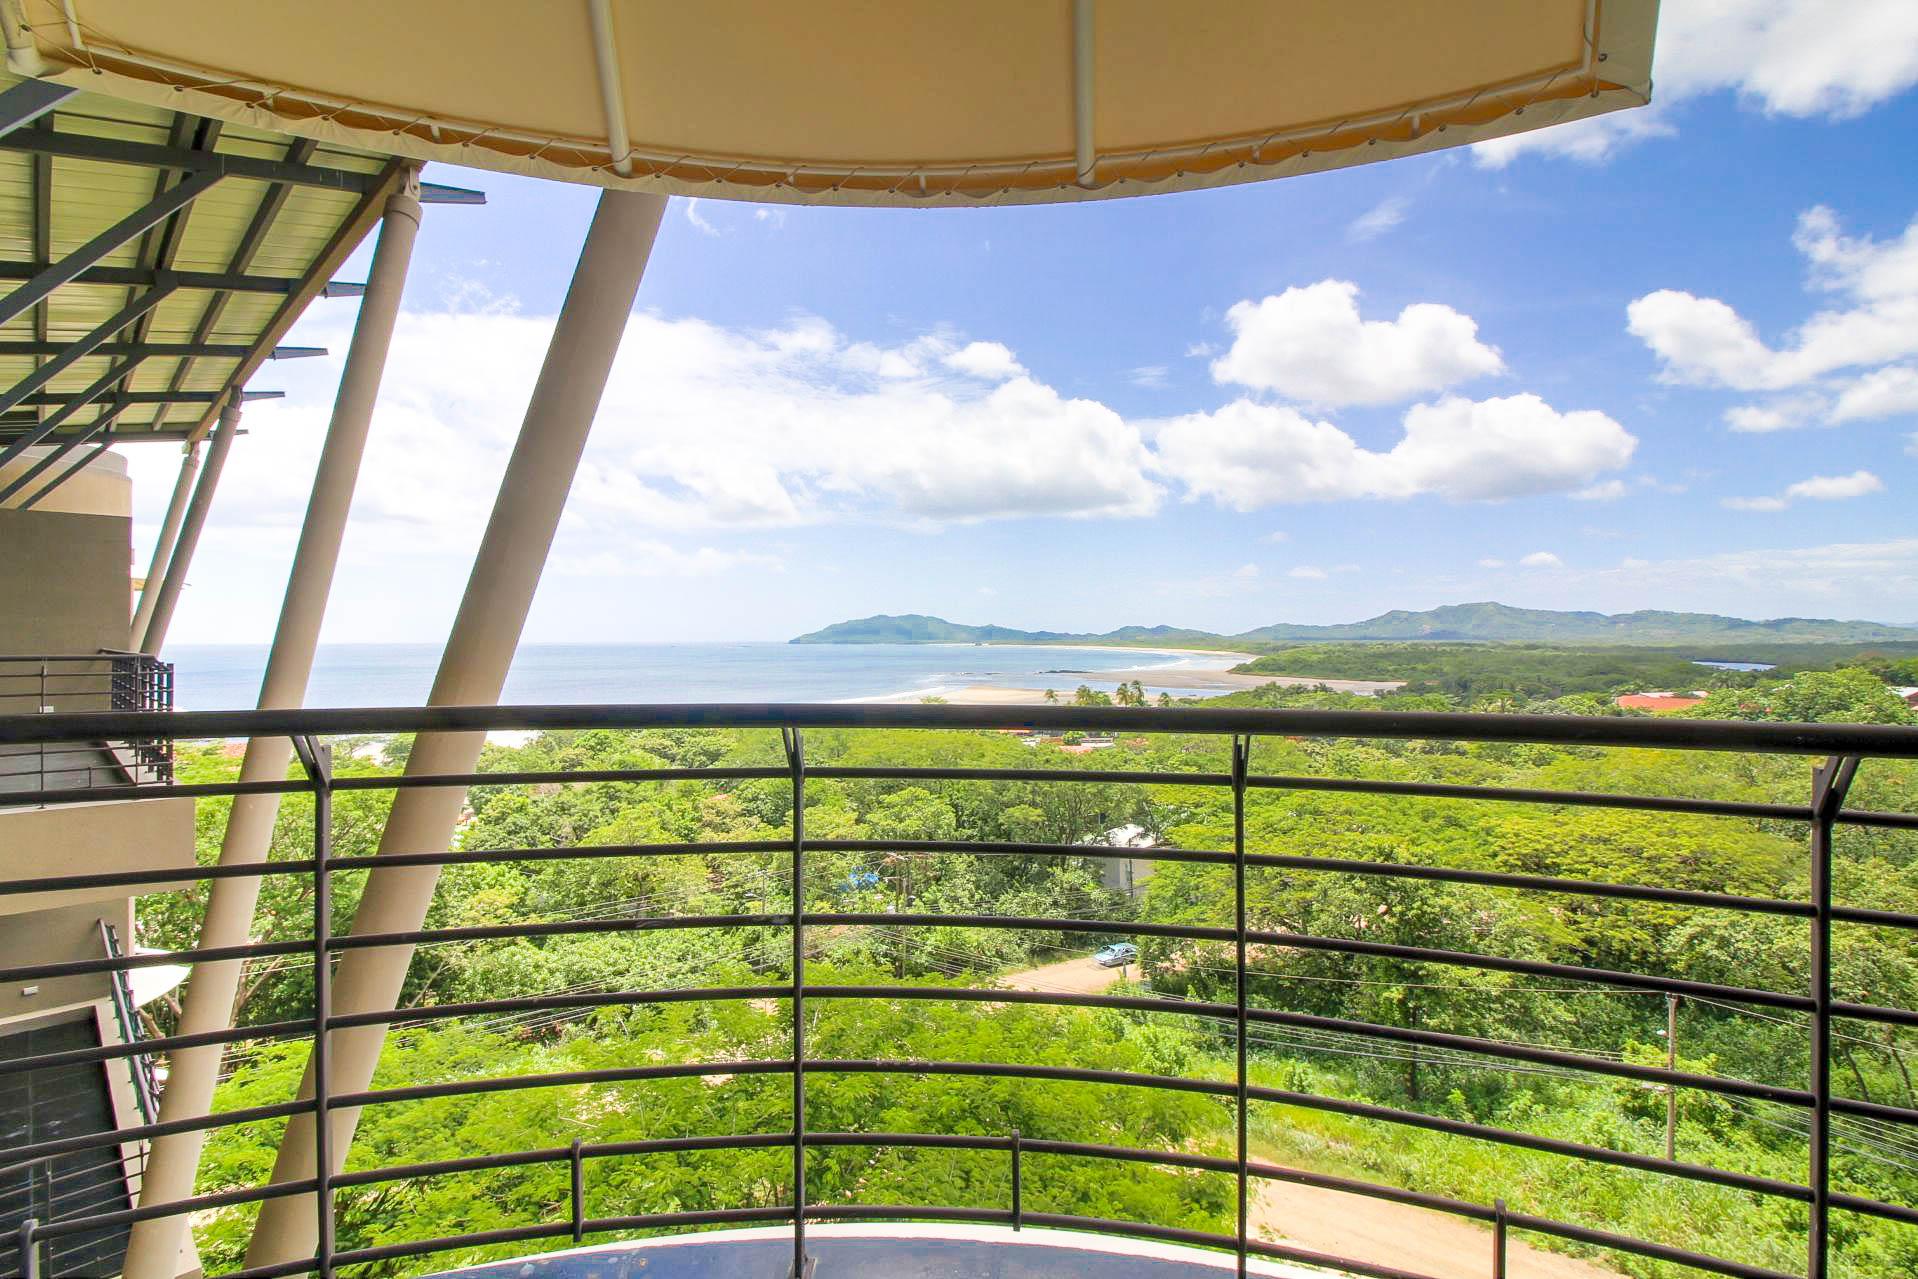 Spectacular view of Tamarindo and Playa Grande